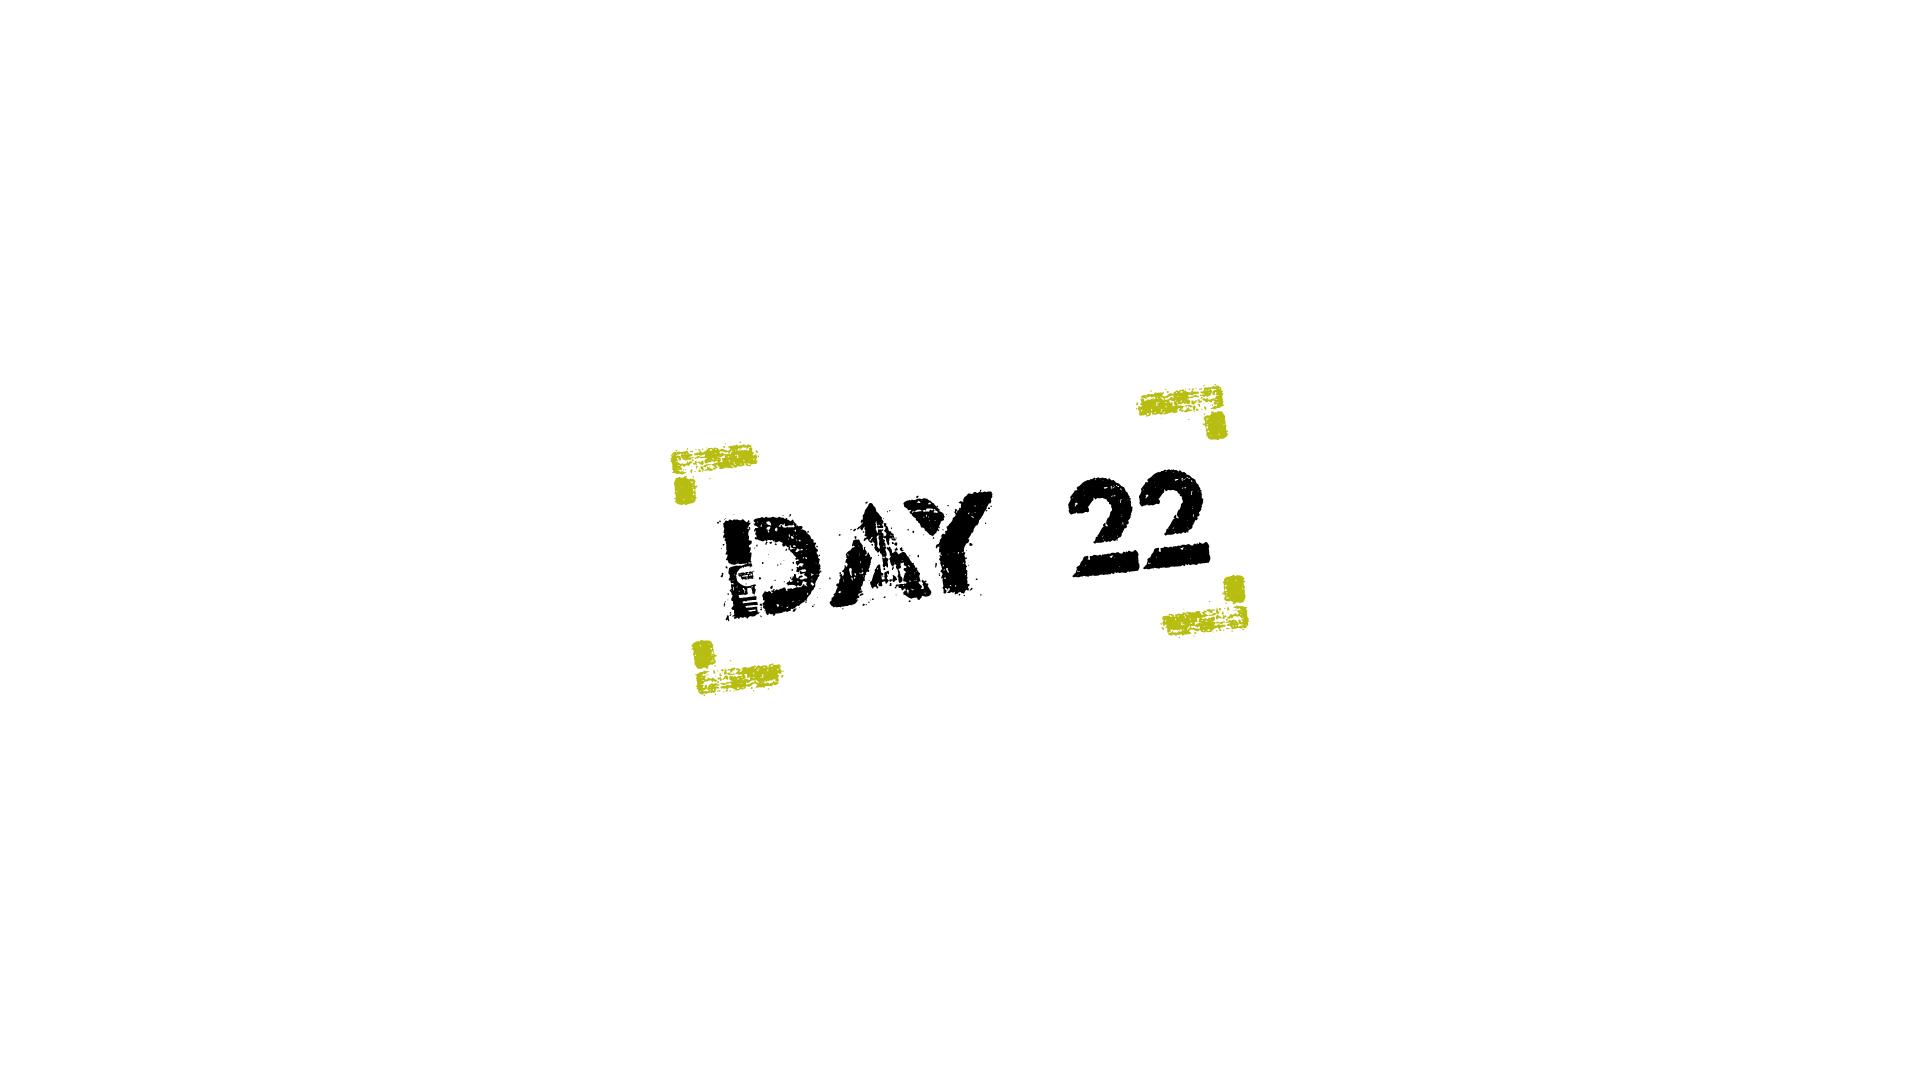 Quarantined - Day 22 - Culture